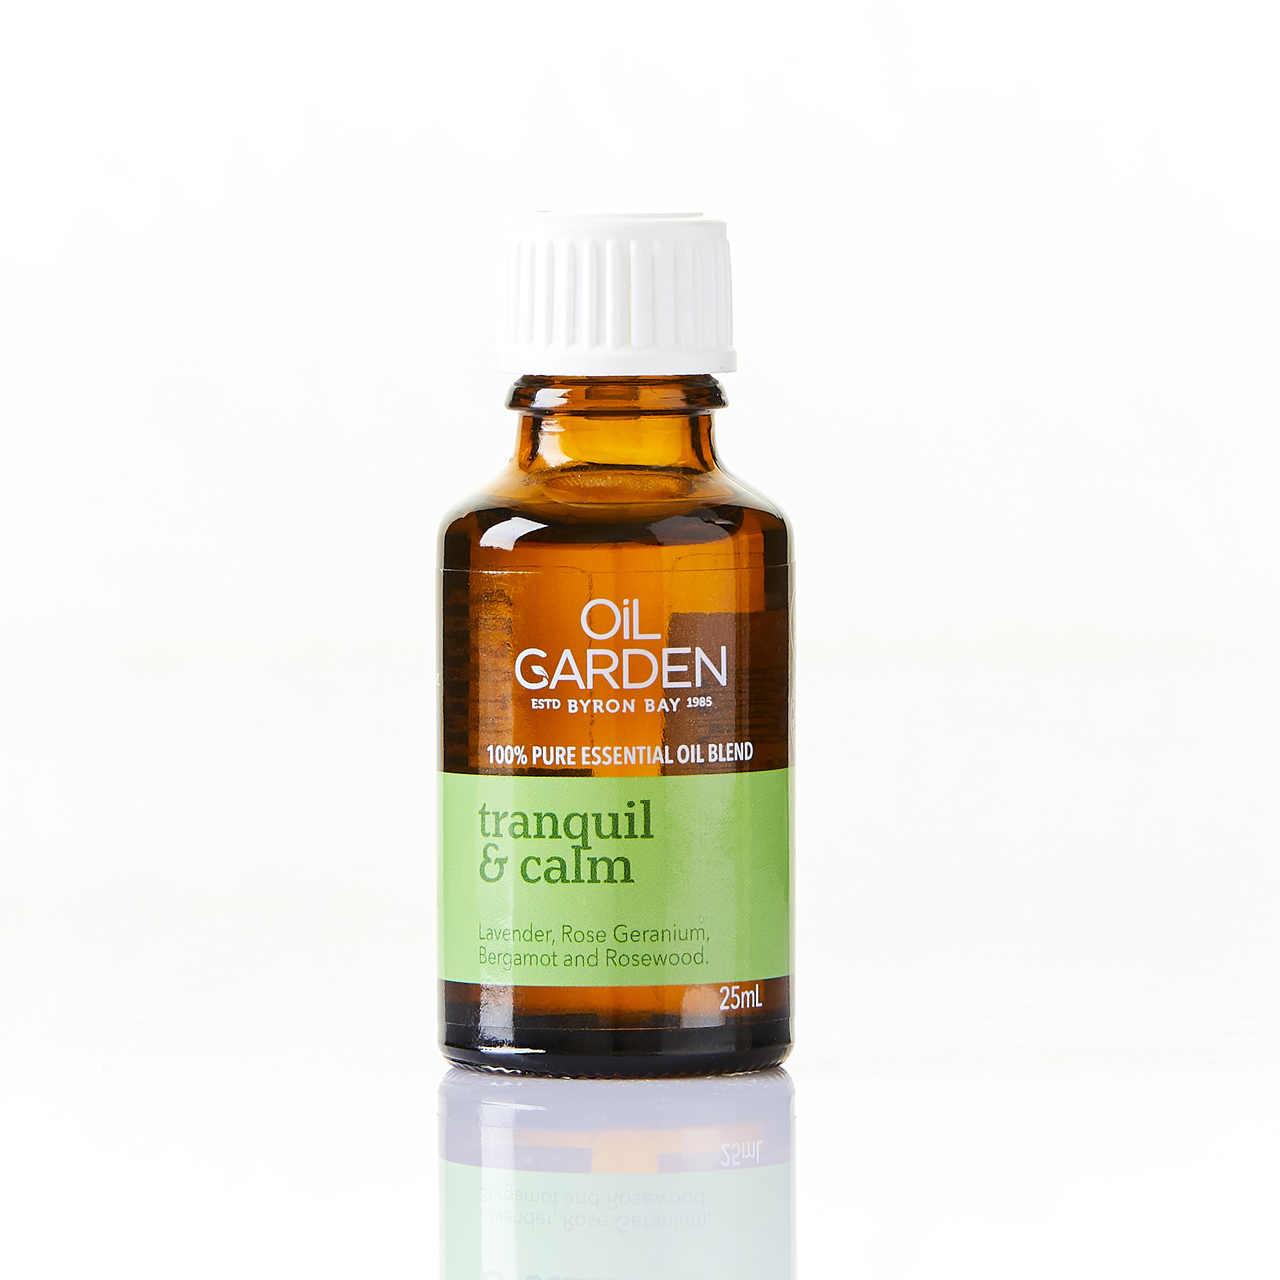 Oil Garden Tranquil & Calm Essential Oil Blend 25mL 6620007